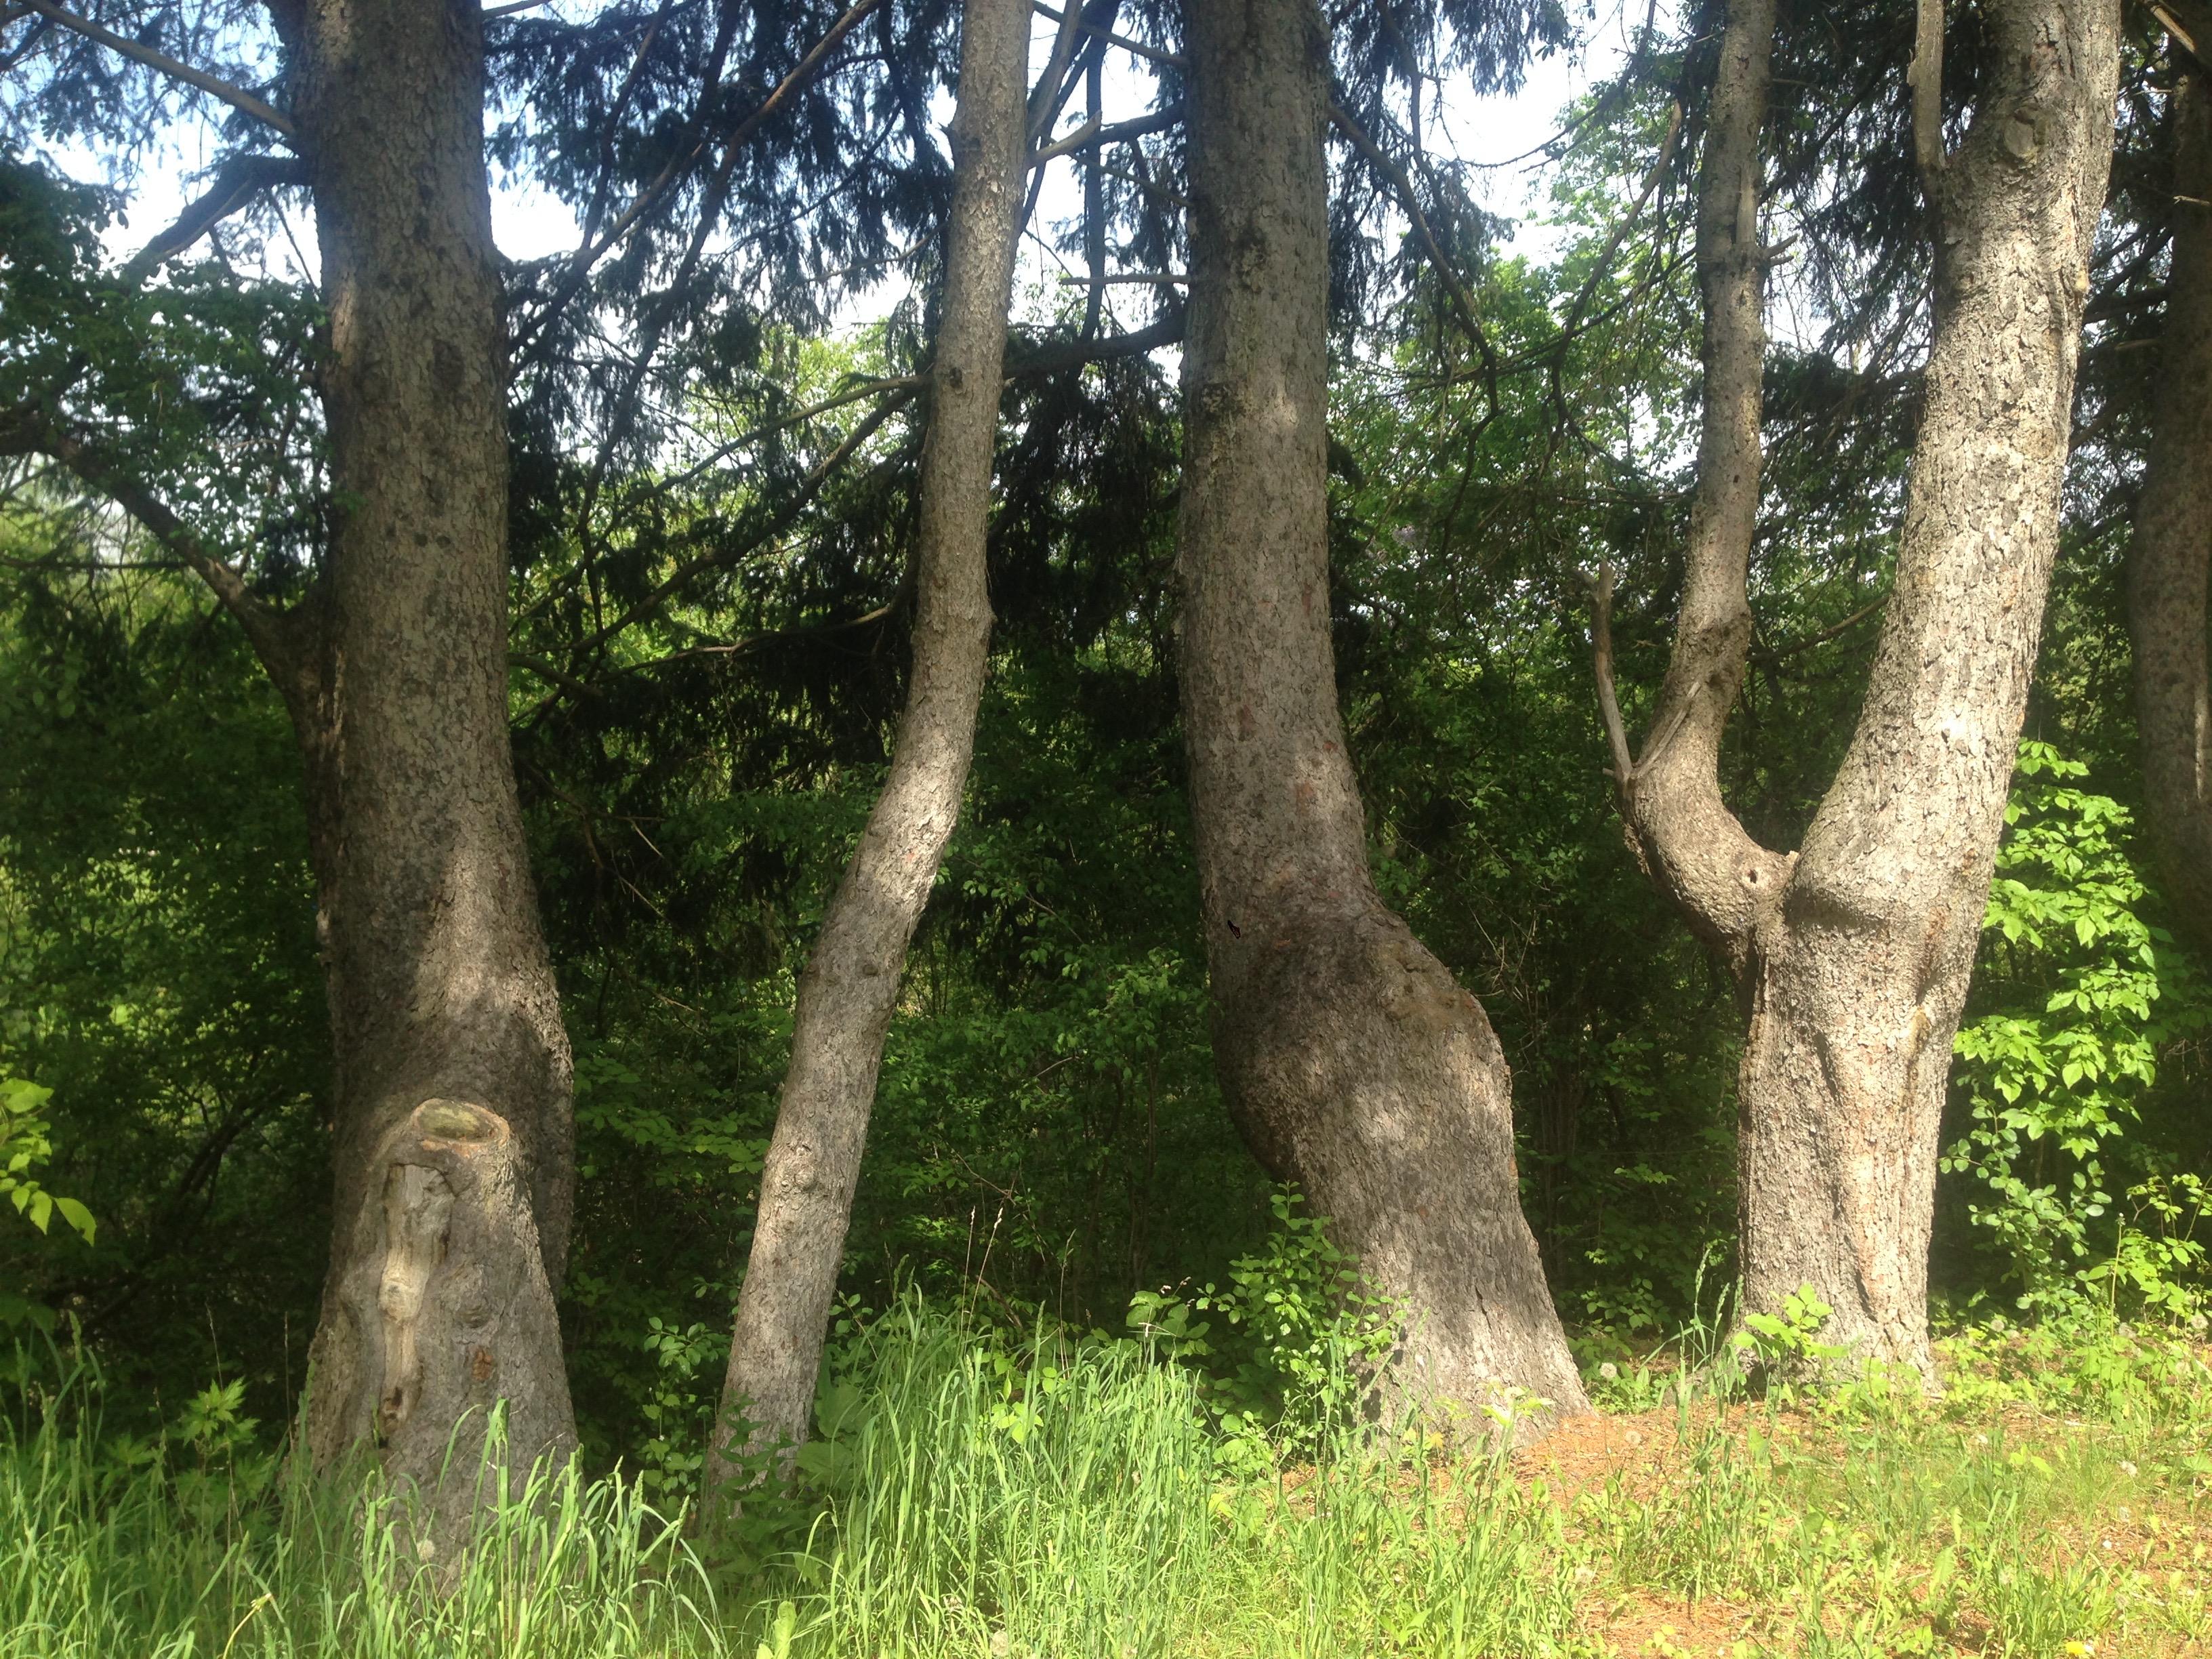 Trees in Toronto Park